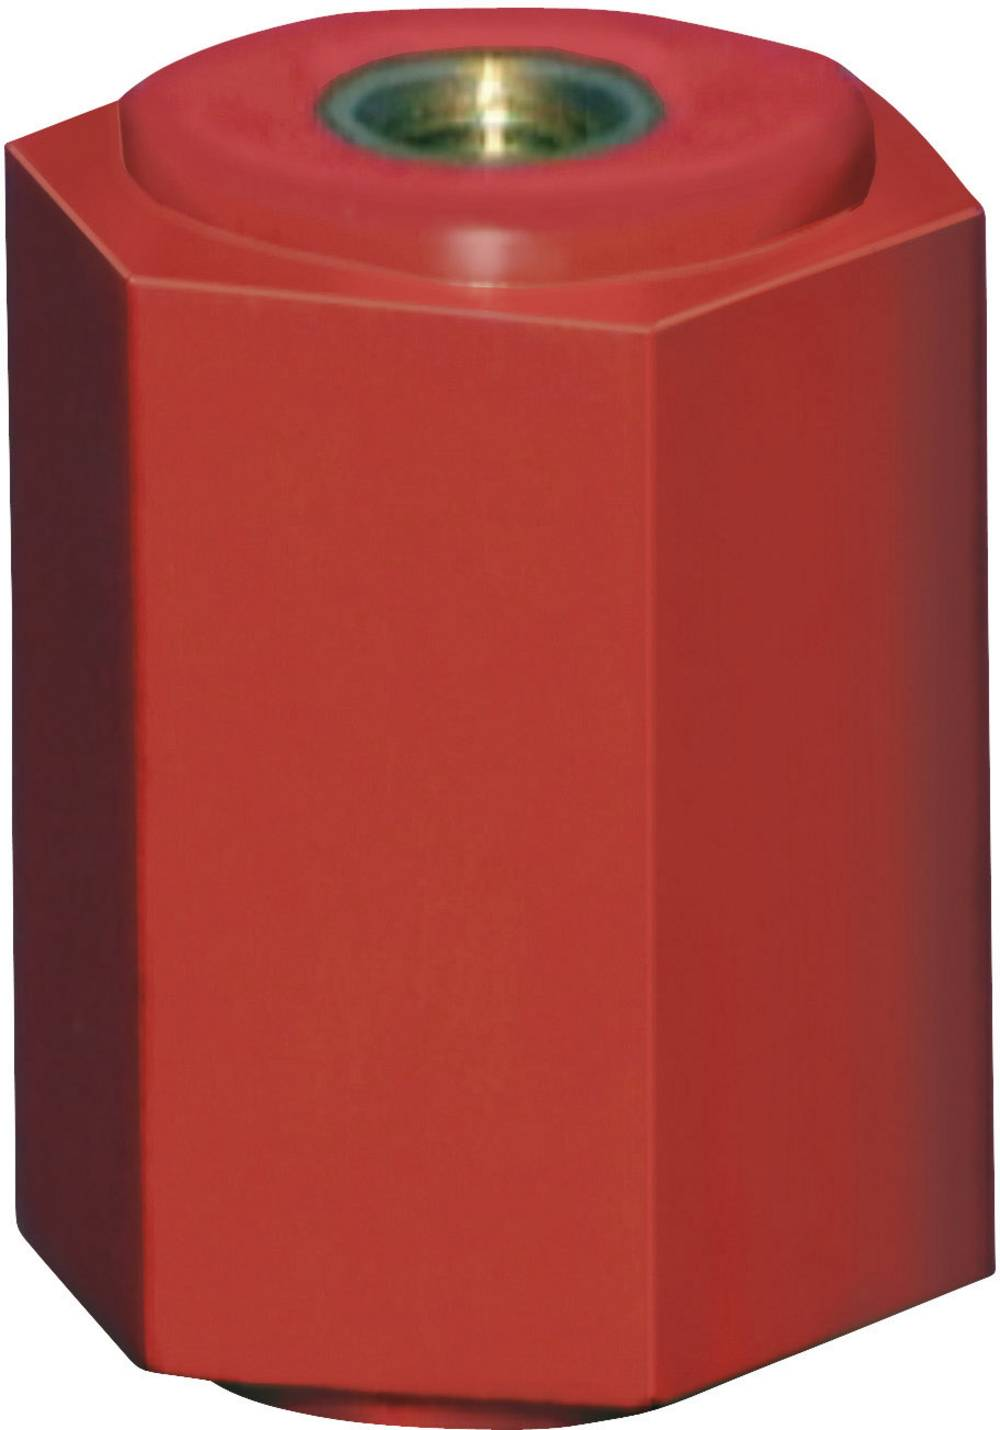 Ĺ estrubi izolacijski potpornik, 25 mm, poliester, ojačan IS25-HH625